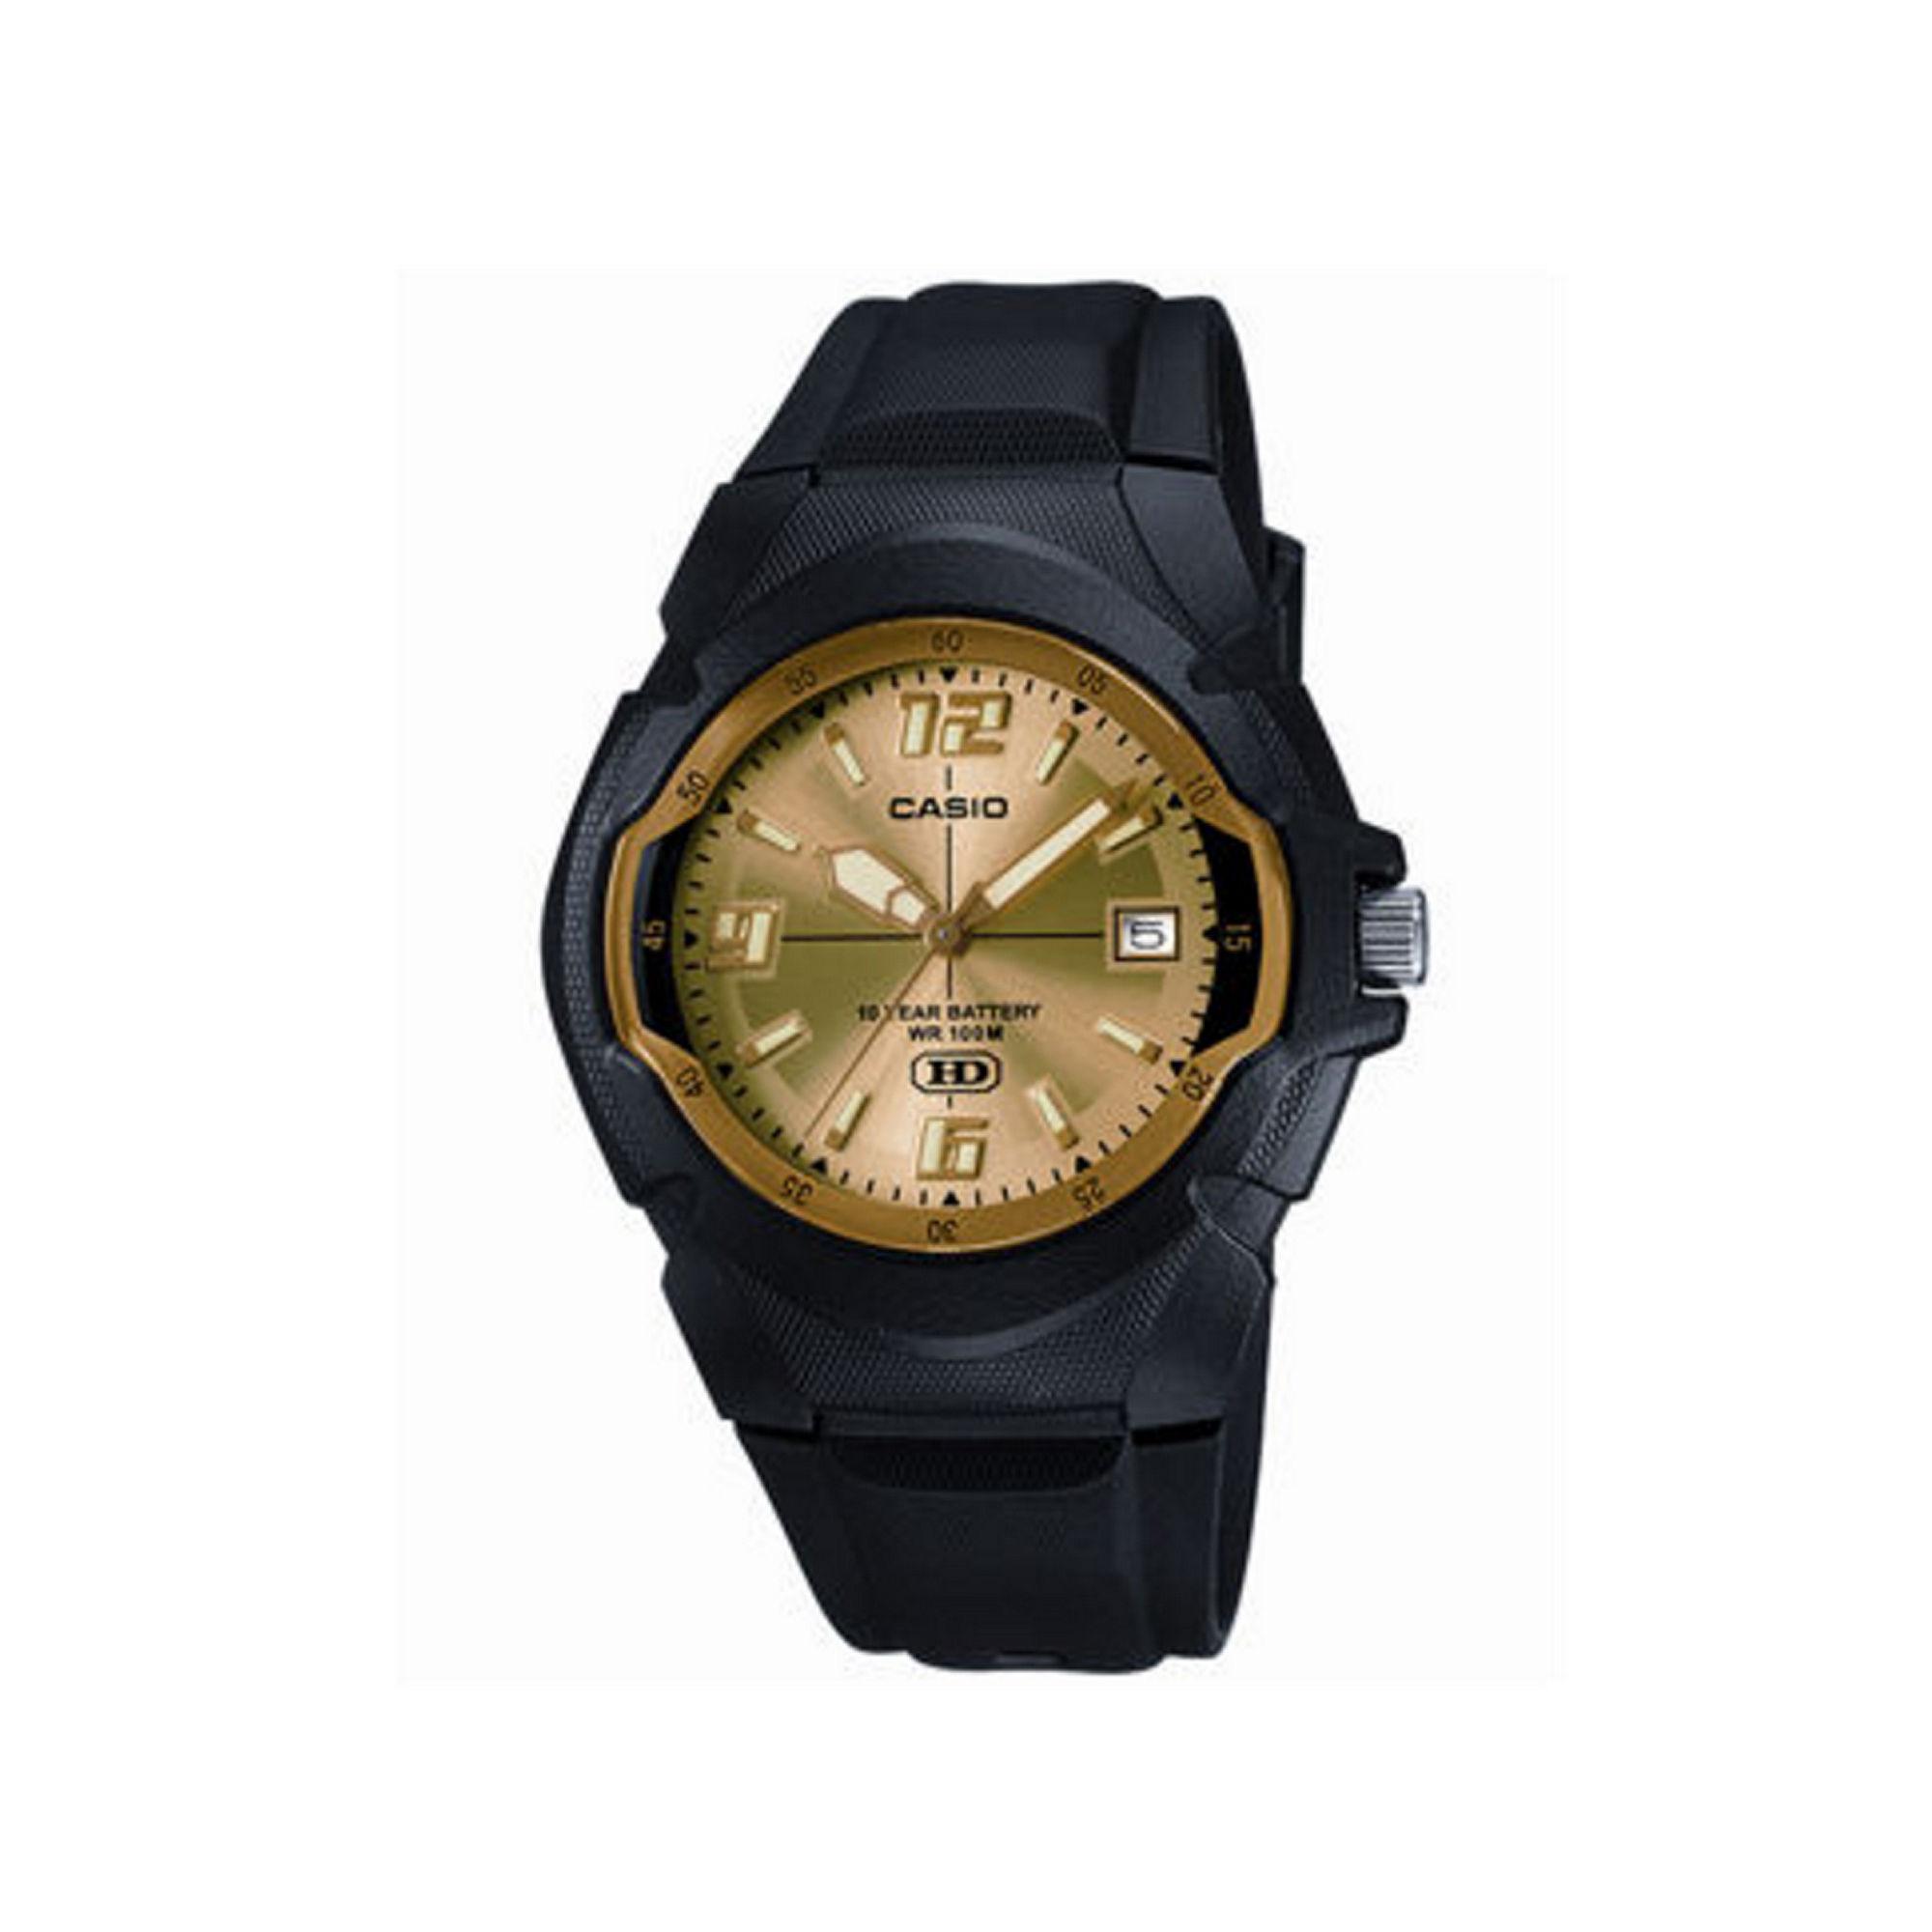 Casio Mens Champagne Dial Black Resin Strap Sport Watch MW600F-9AV